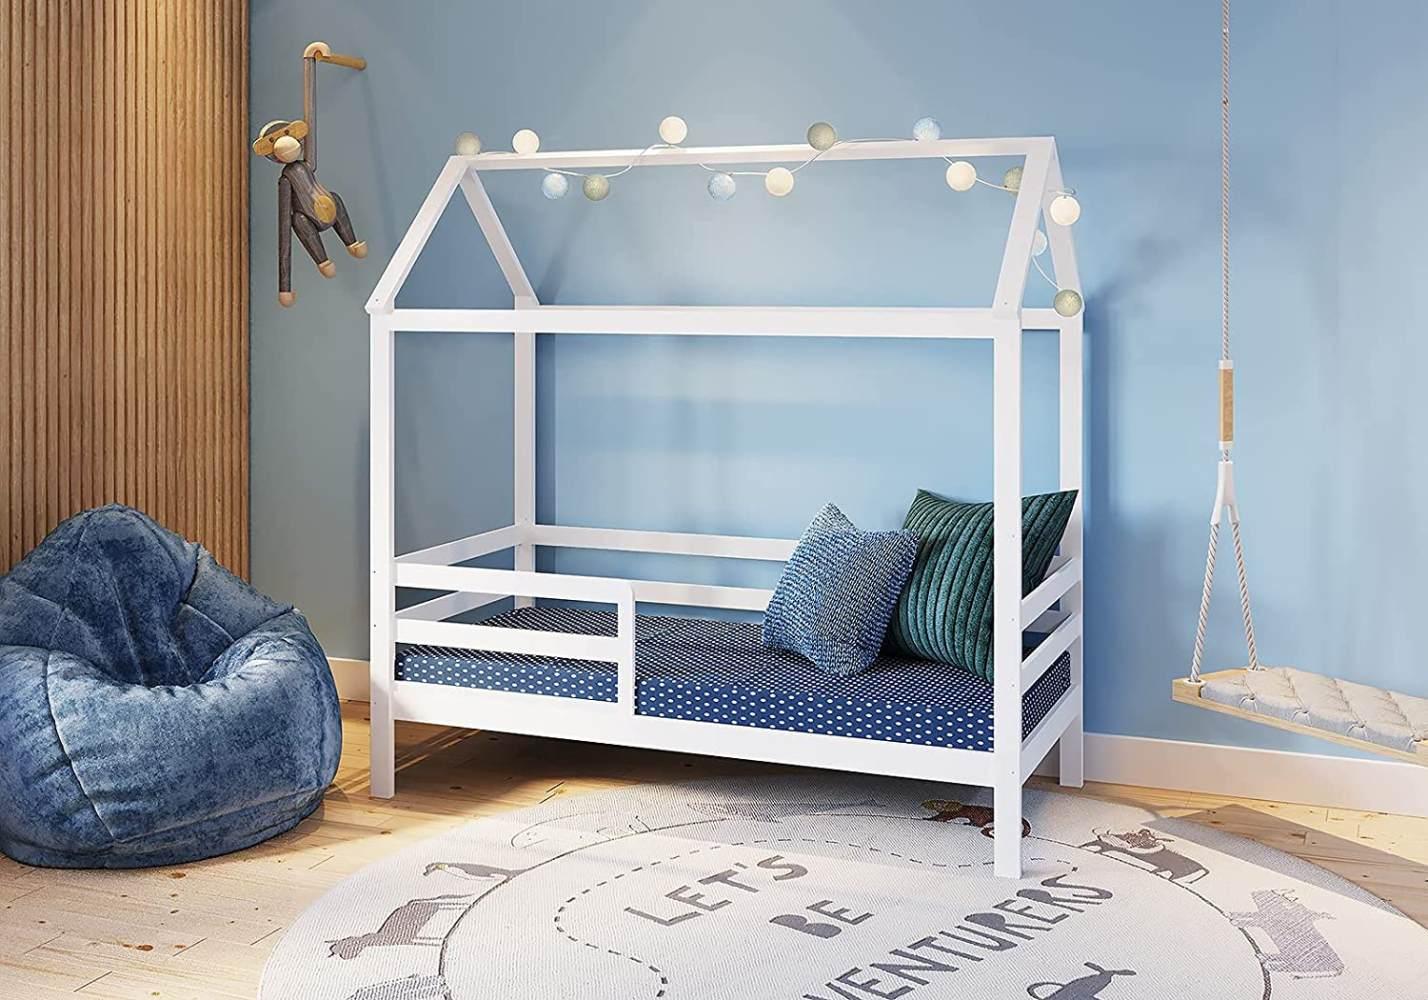 FabiMax 'Schlummerhaus' Kinderbett, 80 x 160 cm, weiß, Kiefer massiv, mit Matratze Classic Bild 1